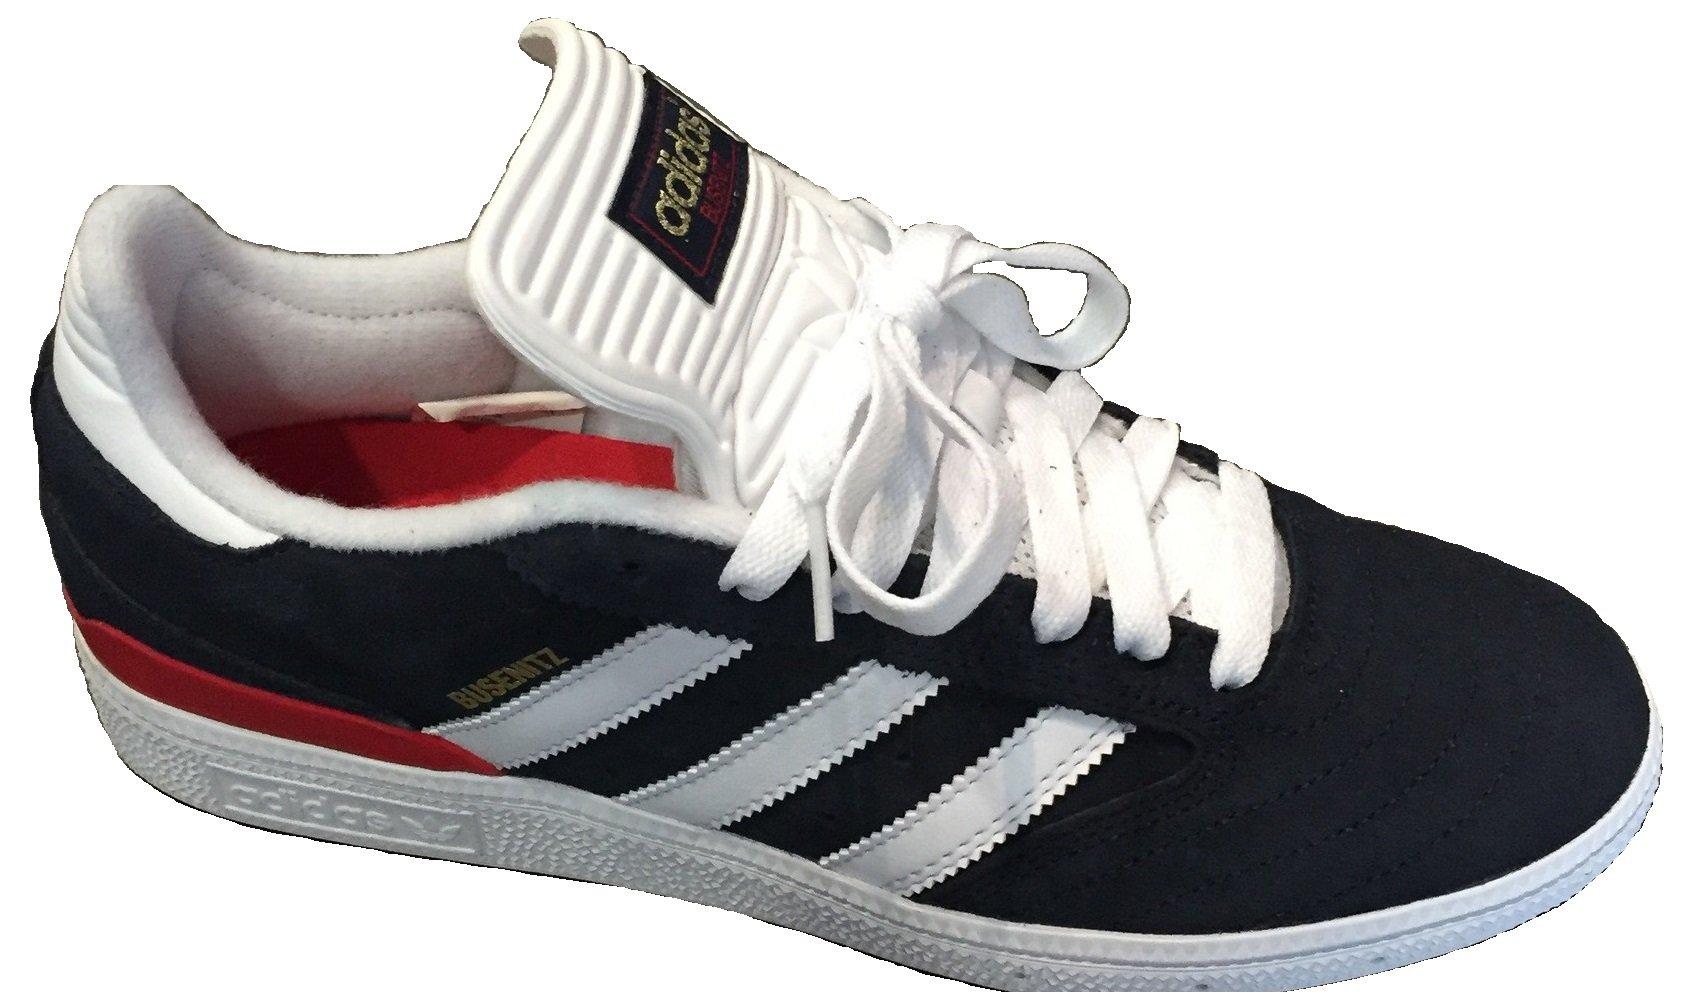 92ee0d5ee15225 Galleon - Adidas Busenitz Pro Shoe - Men s Collegiate Navy White Scarlet  Suede